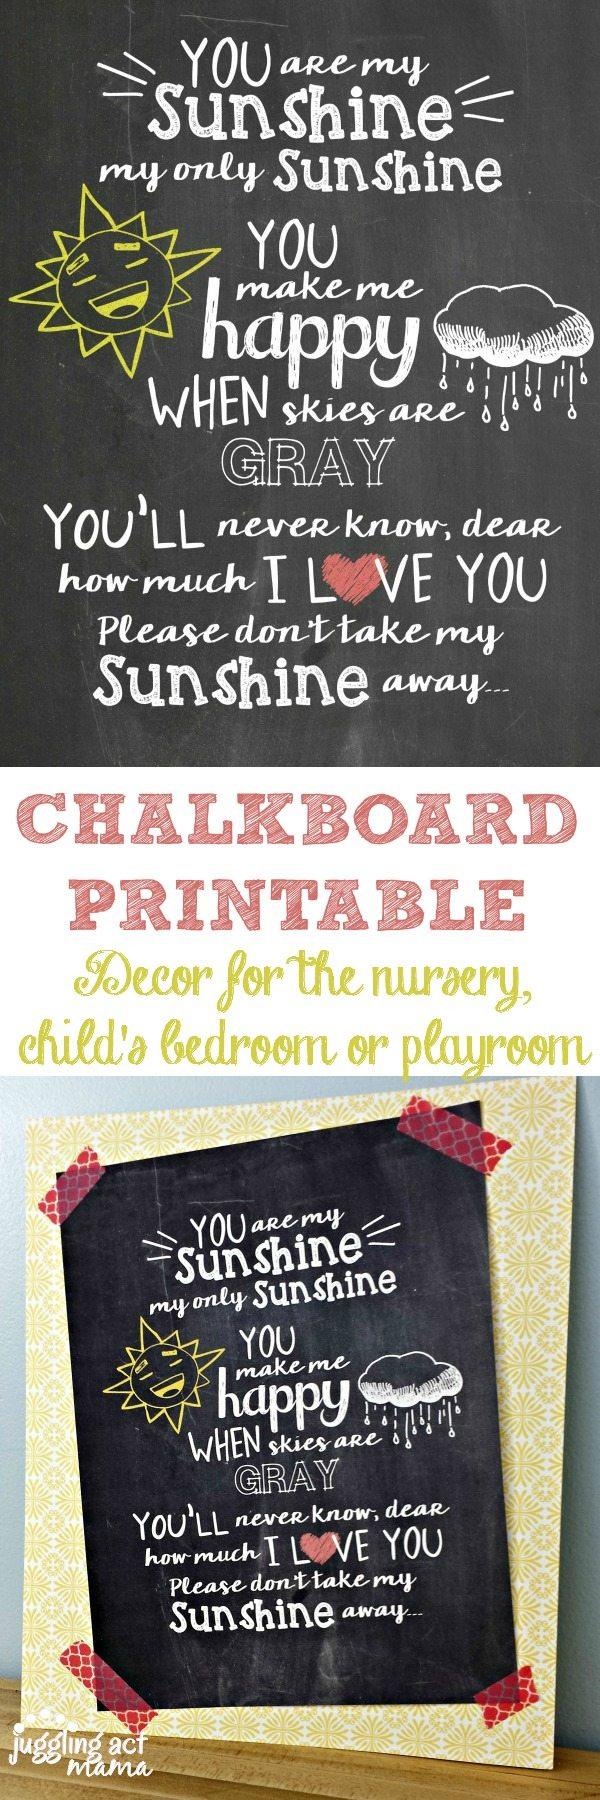 You are My Sunshine Nursery Decor Chalkboard Printable - Juggling Act Mama www.jugglingactmama.com